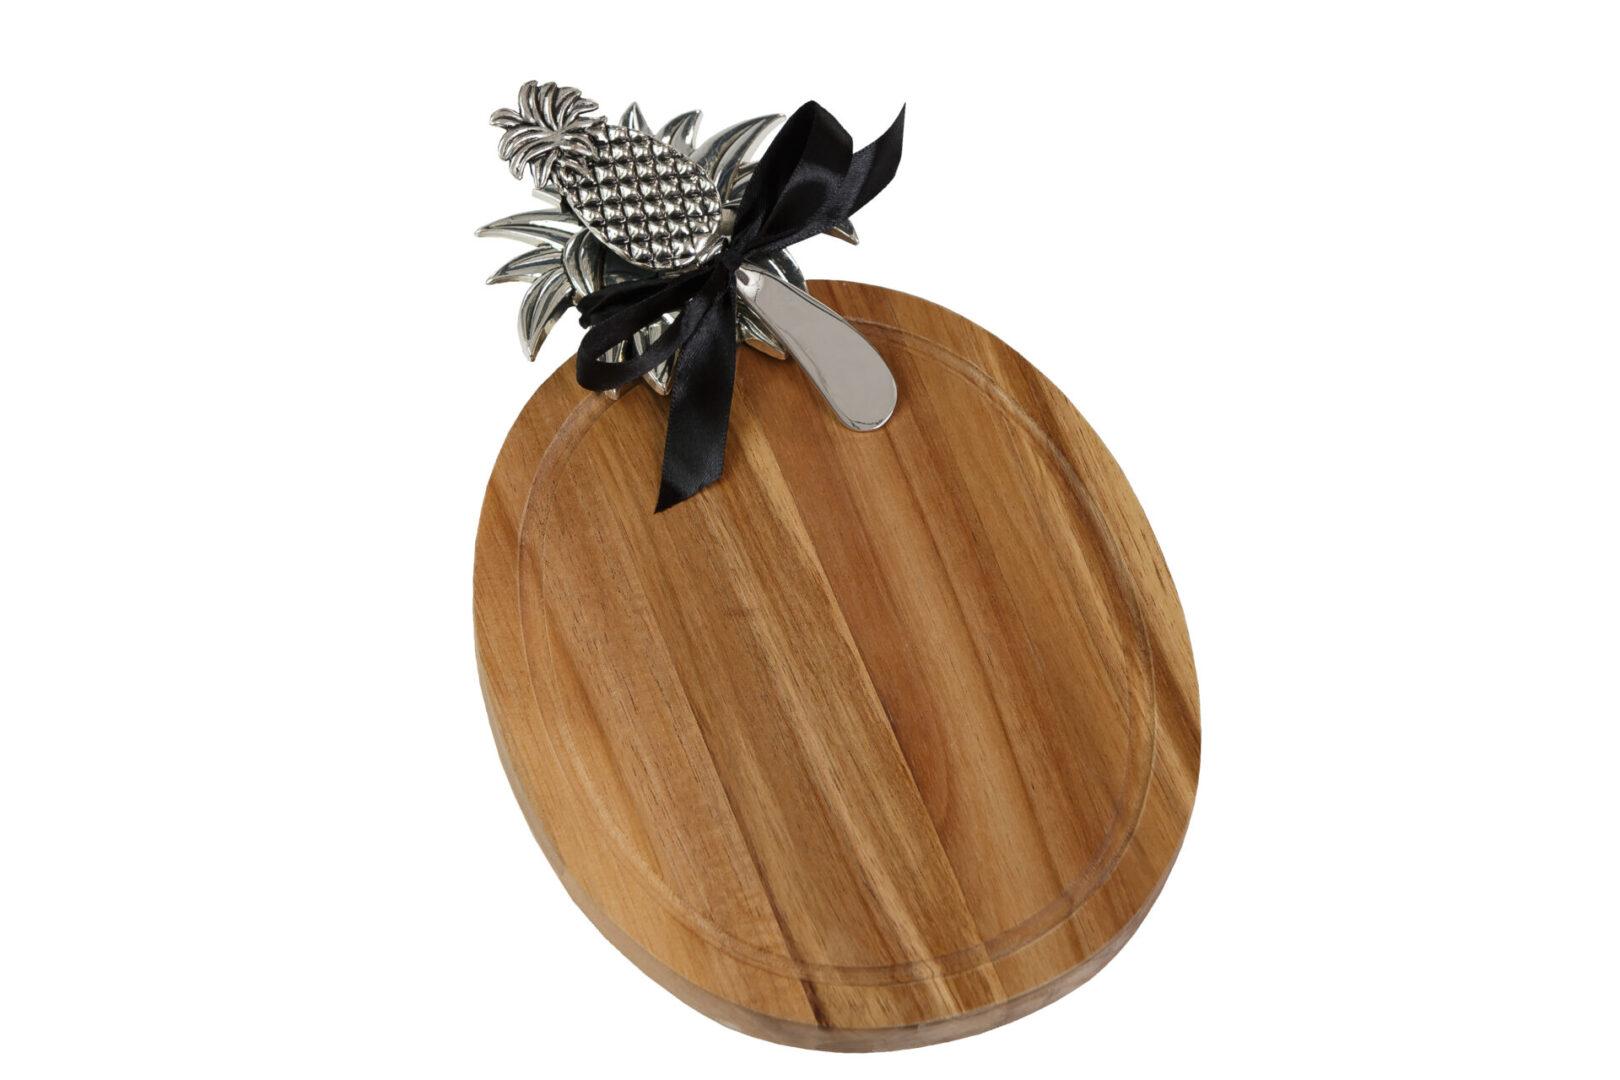 Tropical Cheese Board - Pineapple